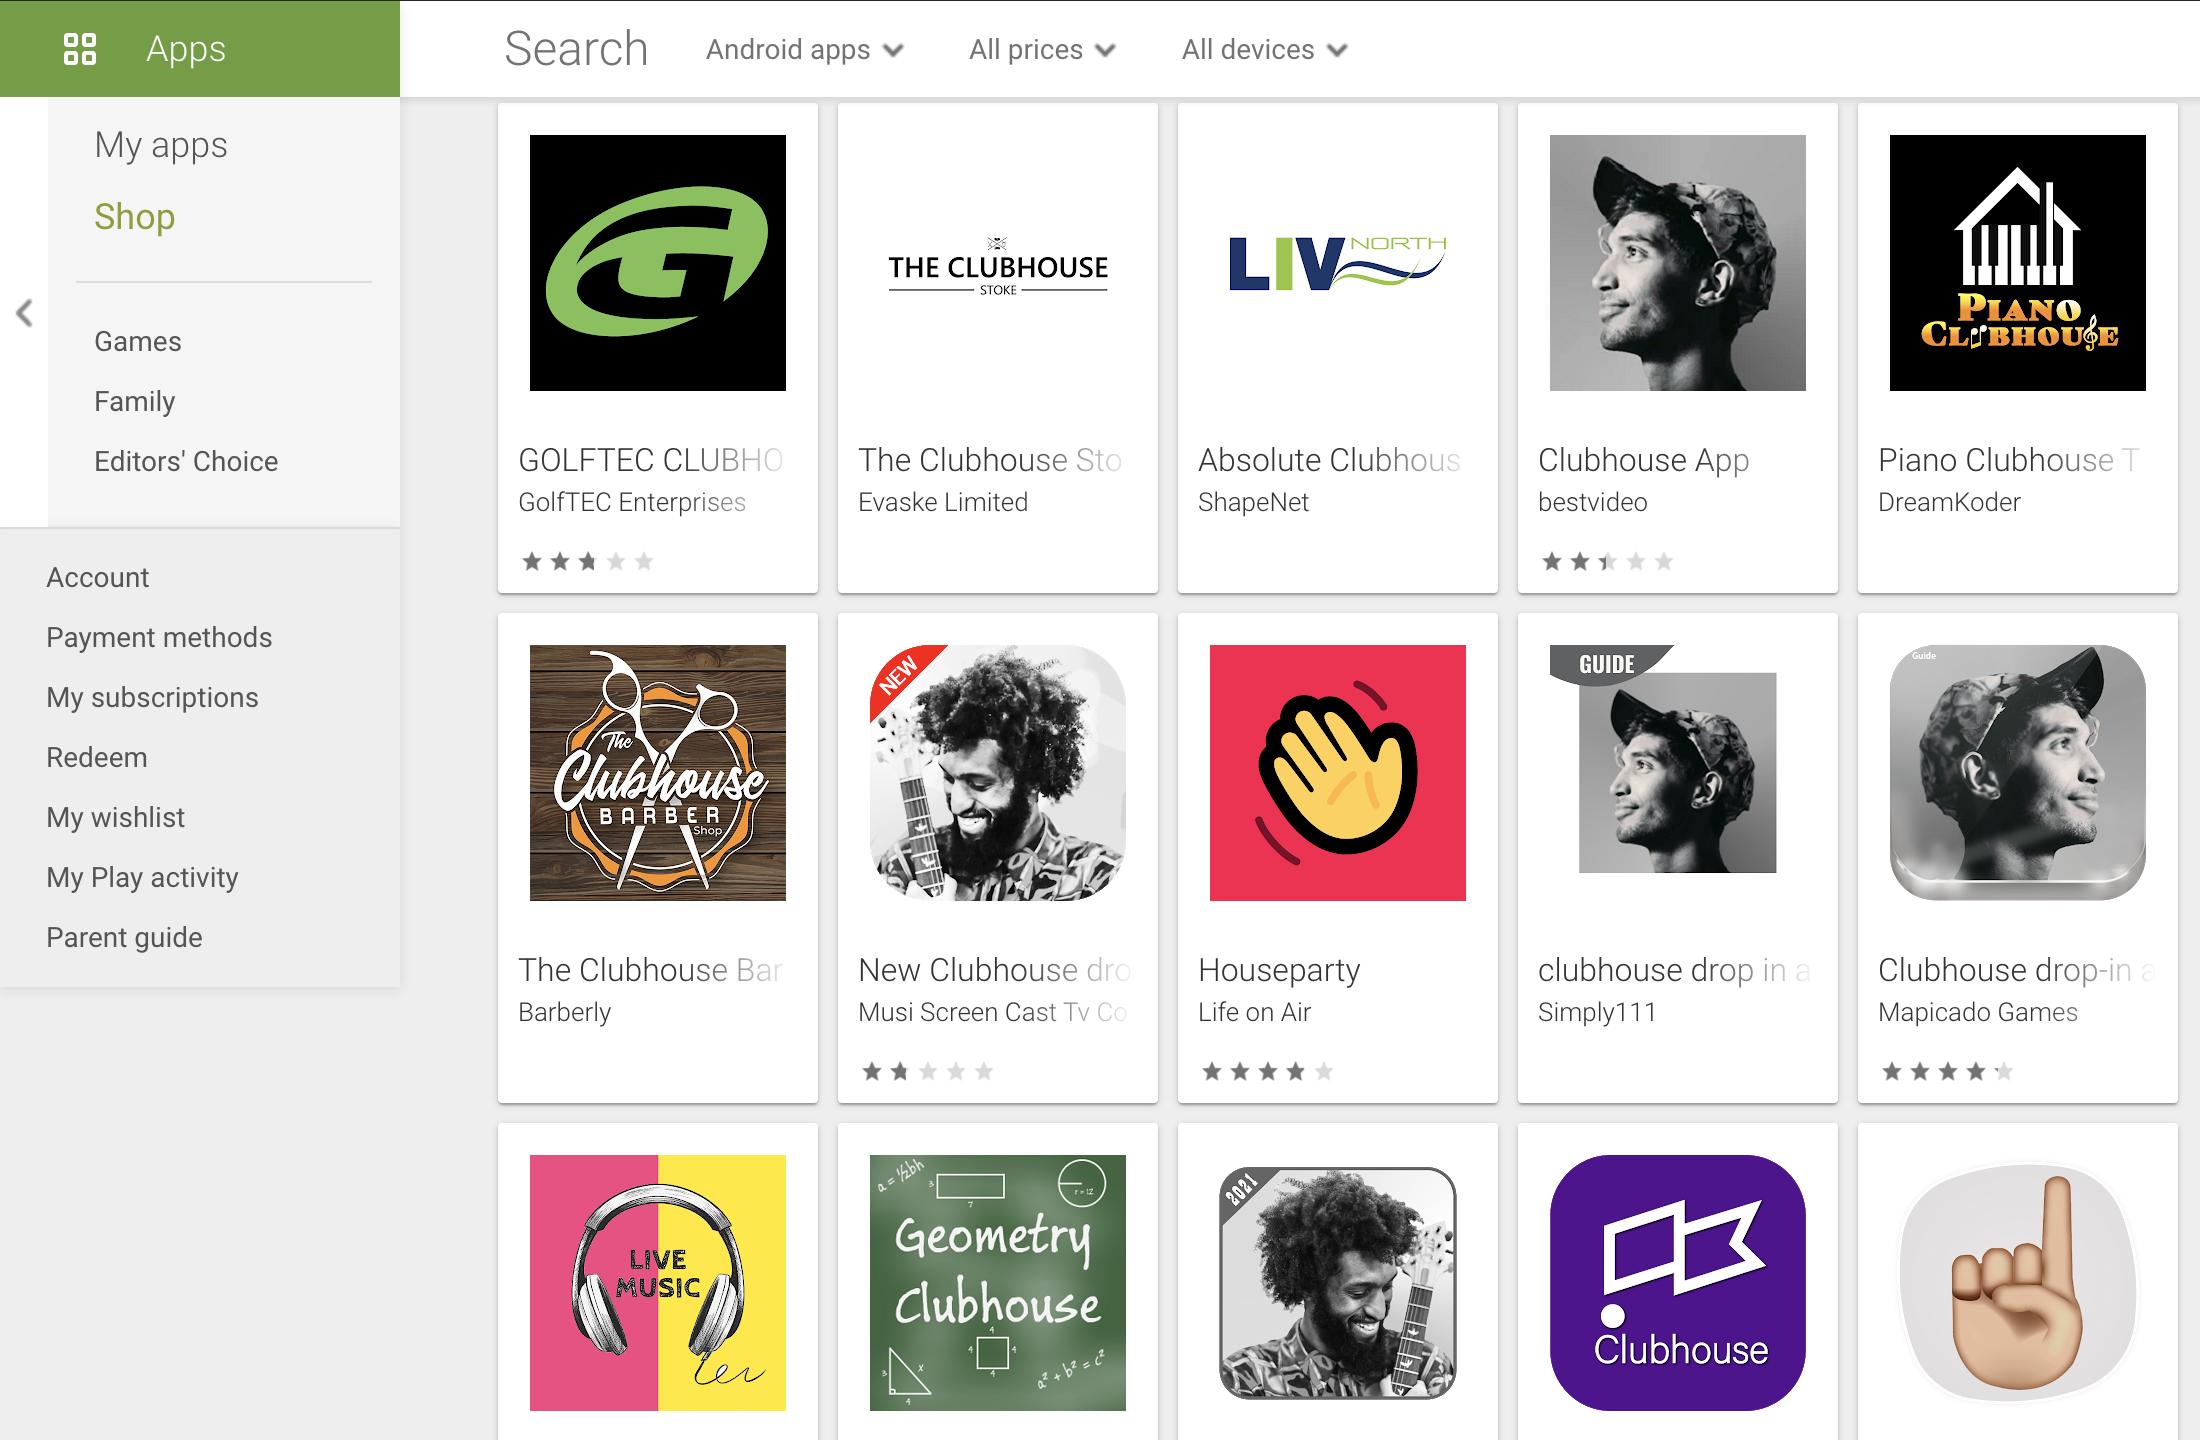 Múltiples aplicaciones falsas de Clubhouse para Android han aparecido en Google Play